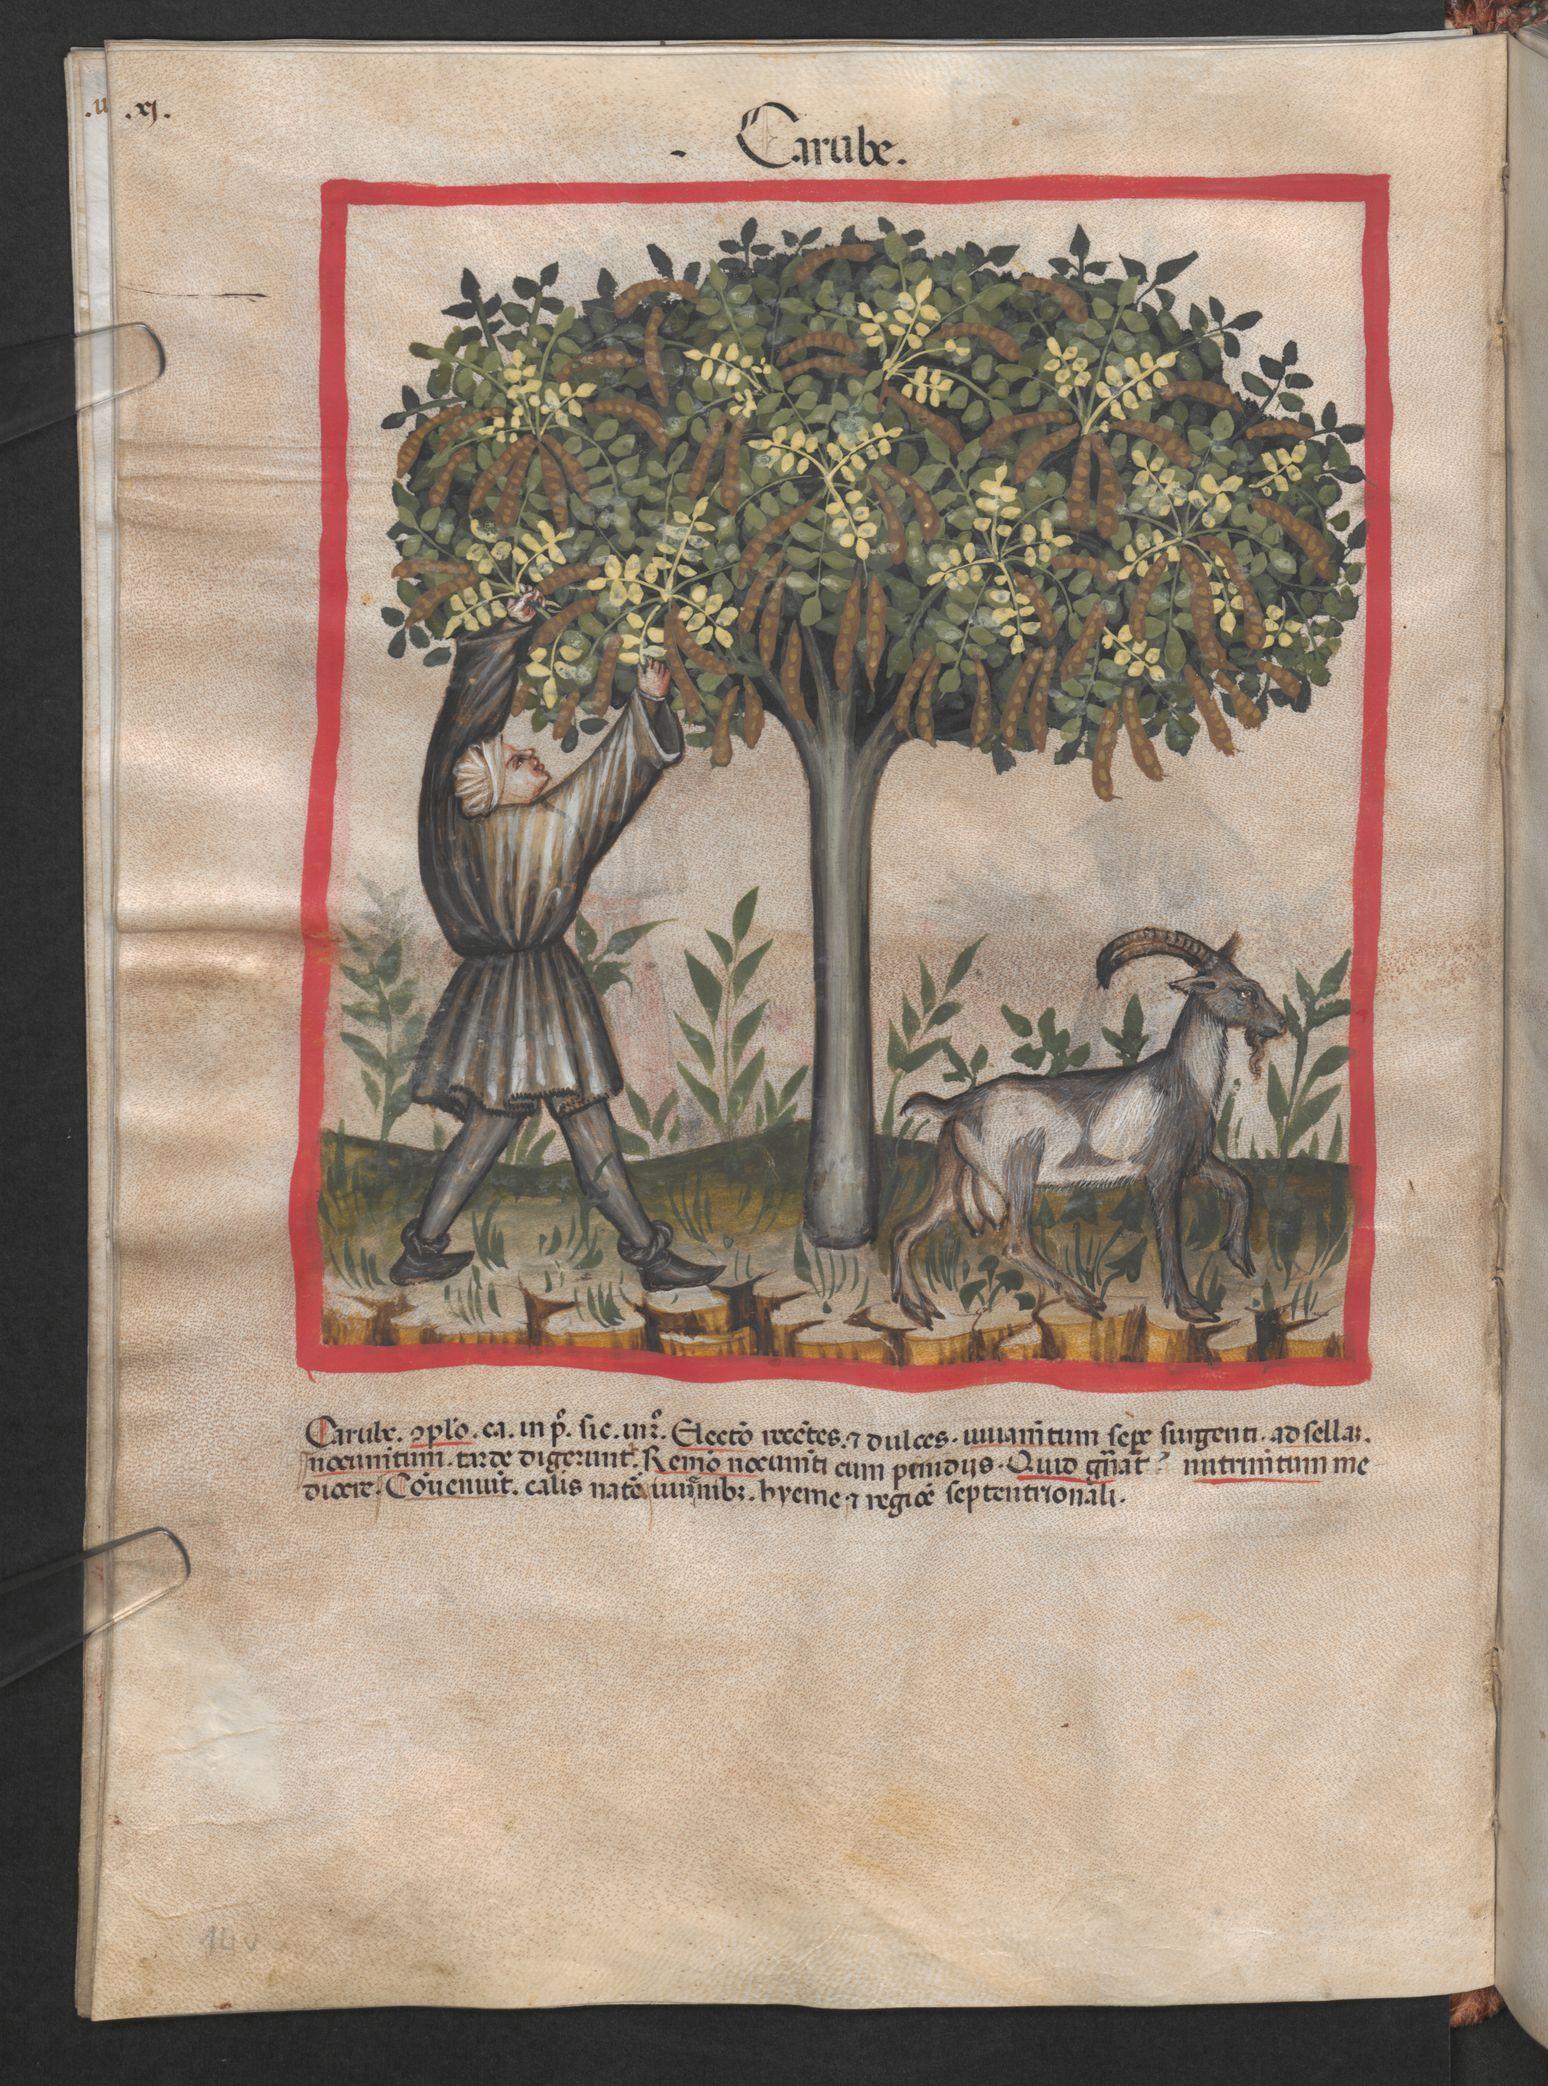 Folio 14v (page 32). Tacuinum sanitatis, Codex Vindobonensis, series nova 2644. Northern Italy, probably Verona, 1380-1399. Keywords: workers' veil